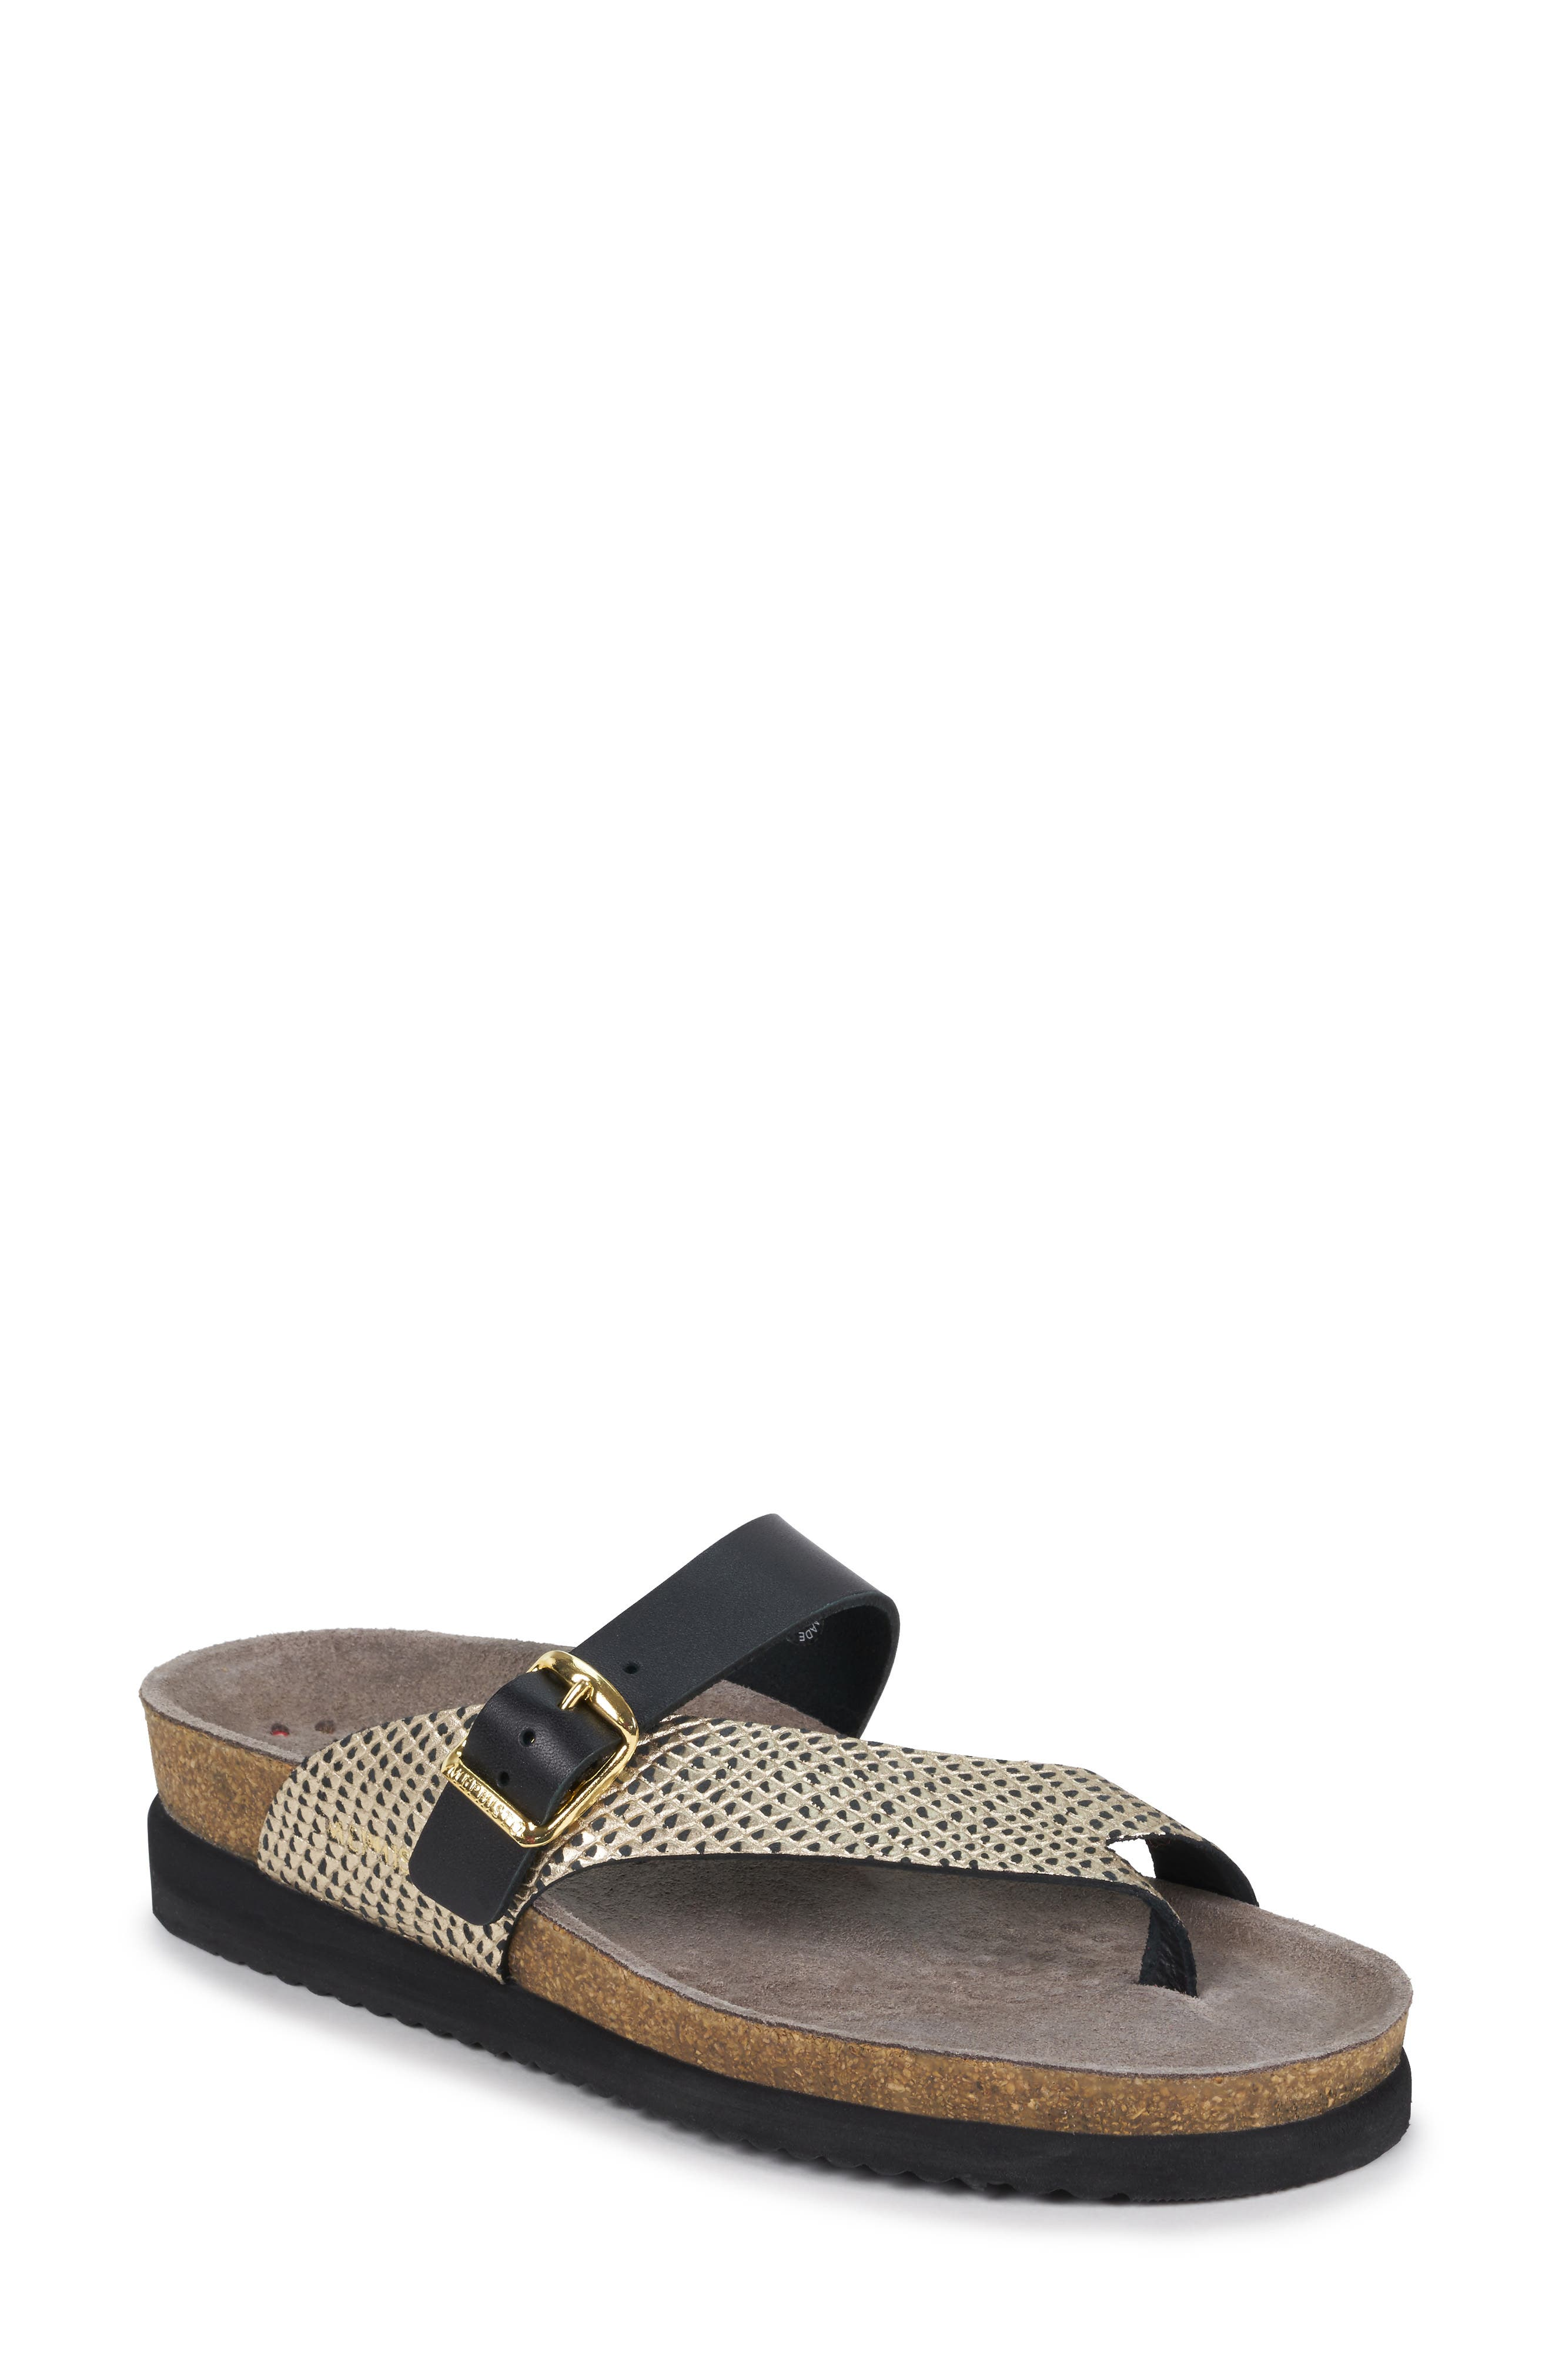 MEPHISTO Helen Mix Sandal, Main, color, BLACK/ GOLD